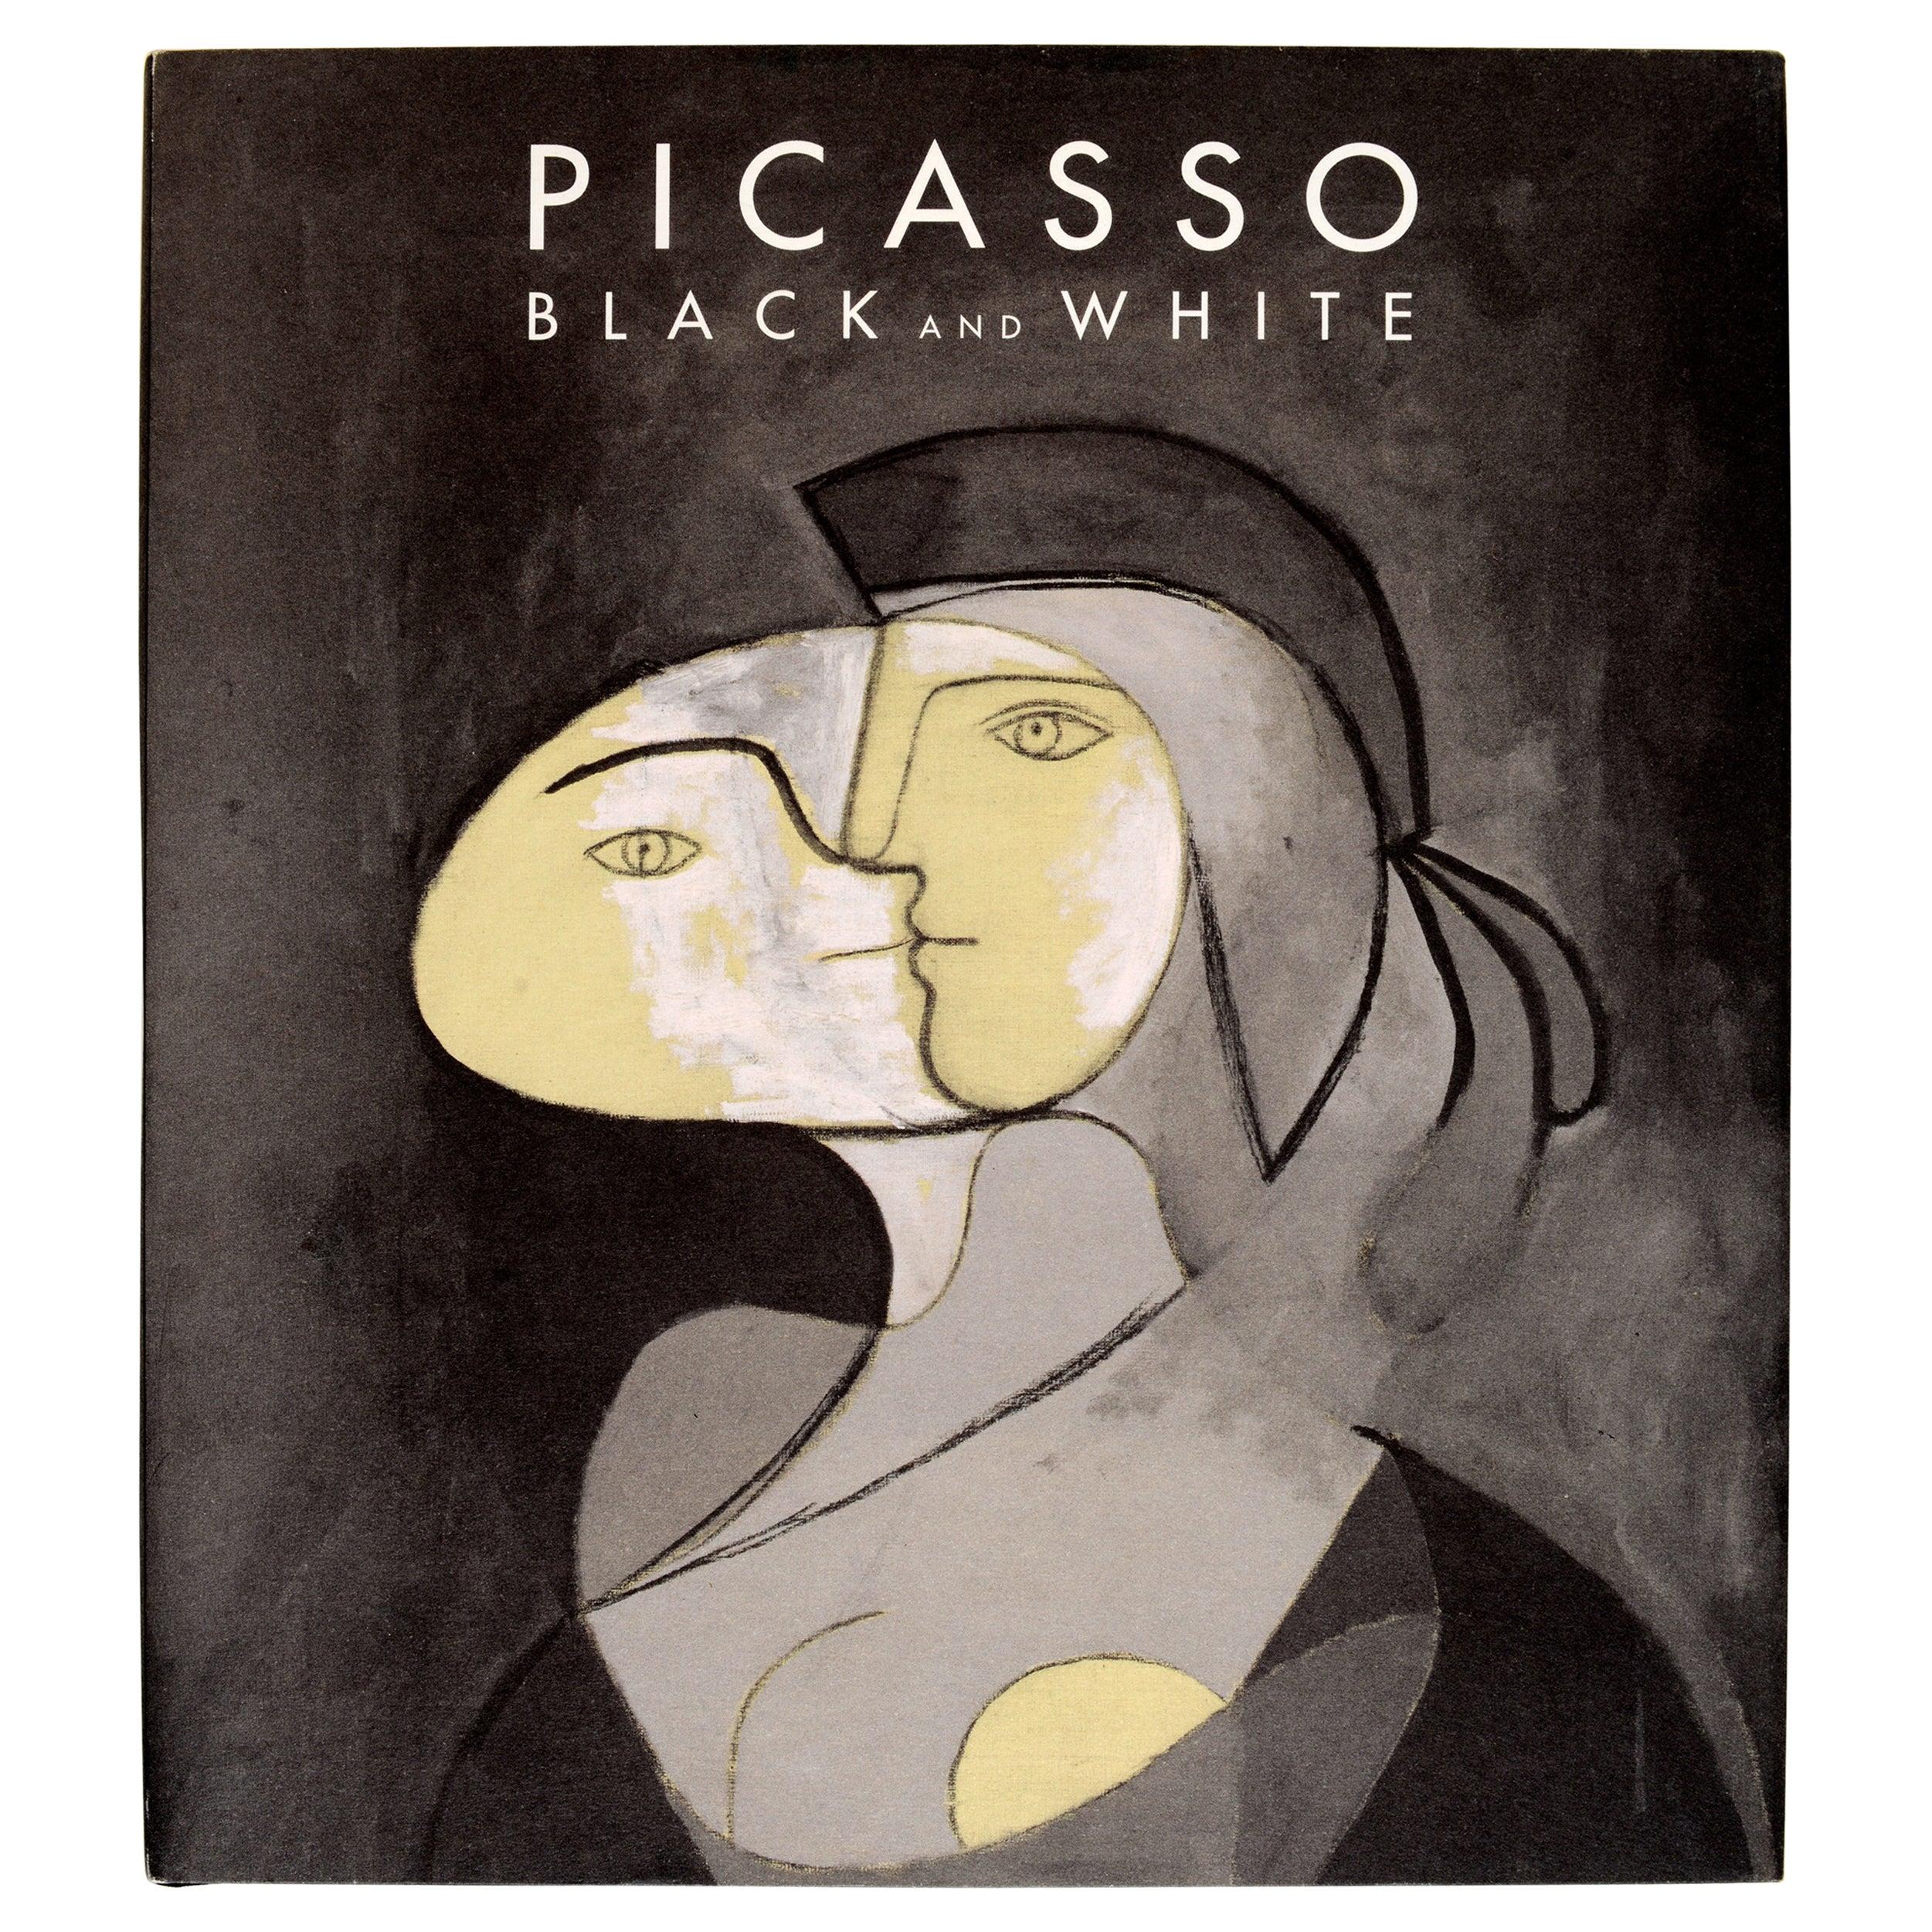 Picasso Black and White by Carmen Gimenez, 1st Ed Exhibition Catalog